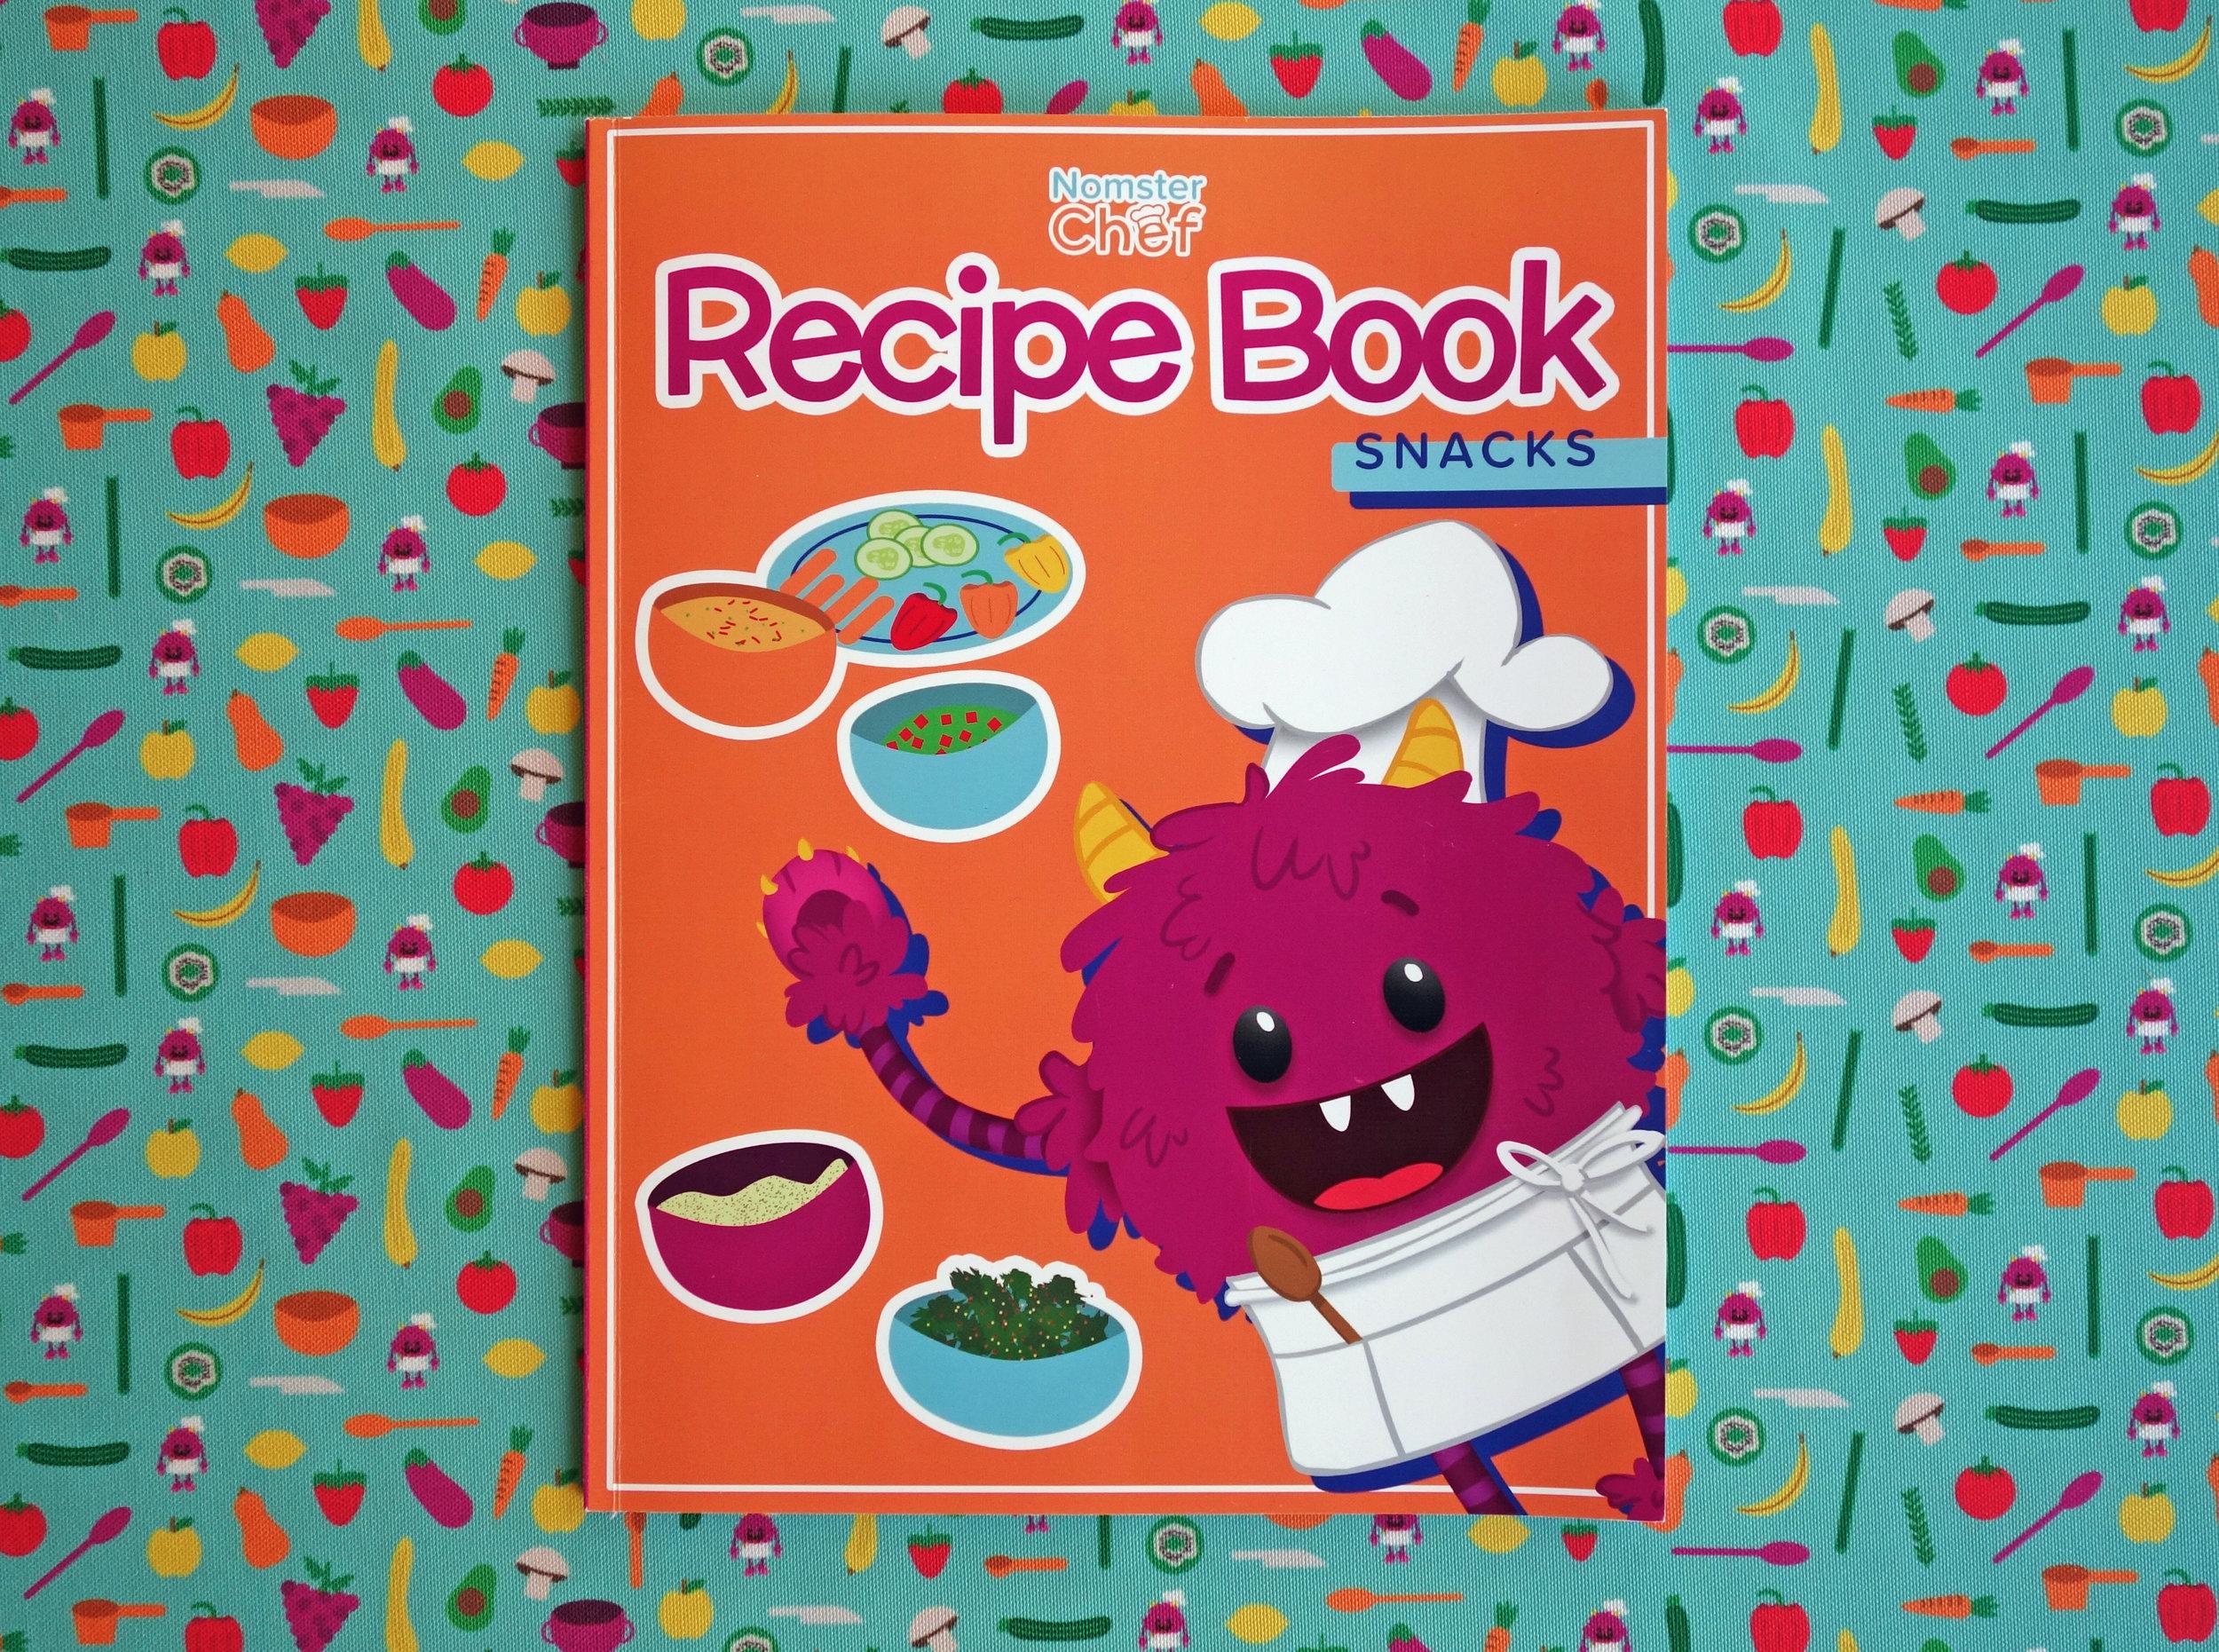 Nomster Chef Recipe Books Snacks - Cookbooks for Kids